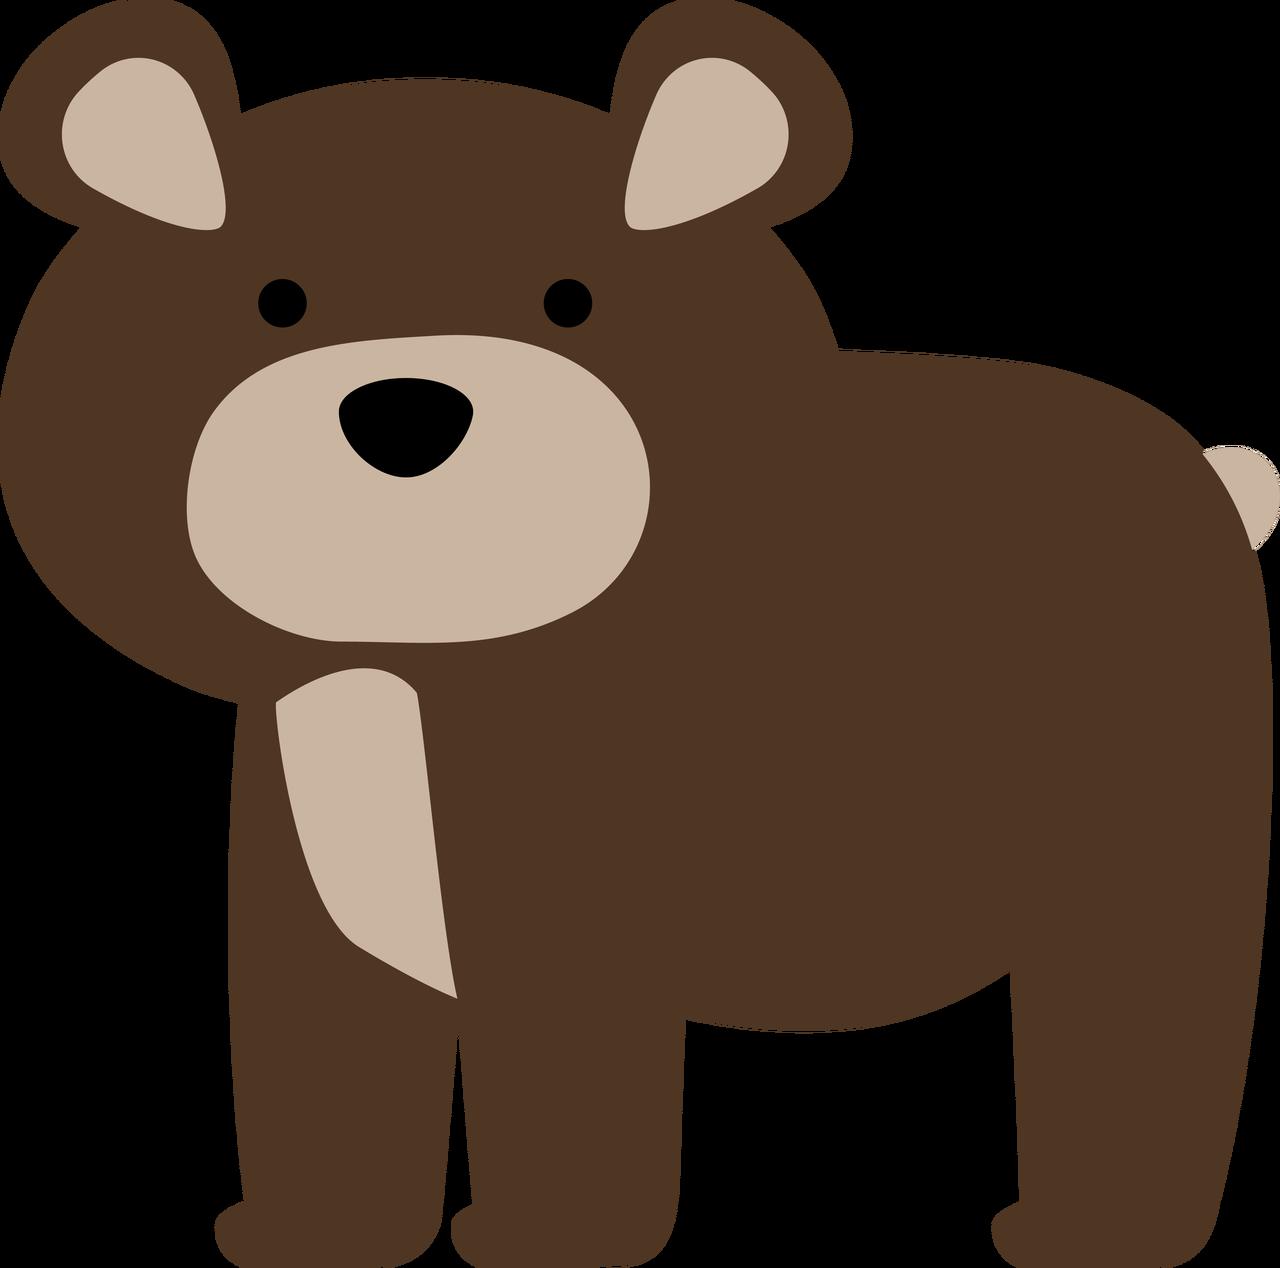 Bear #4 SVG Cut File